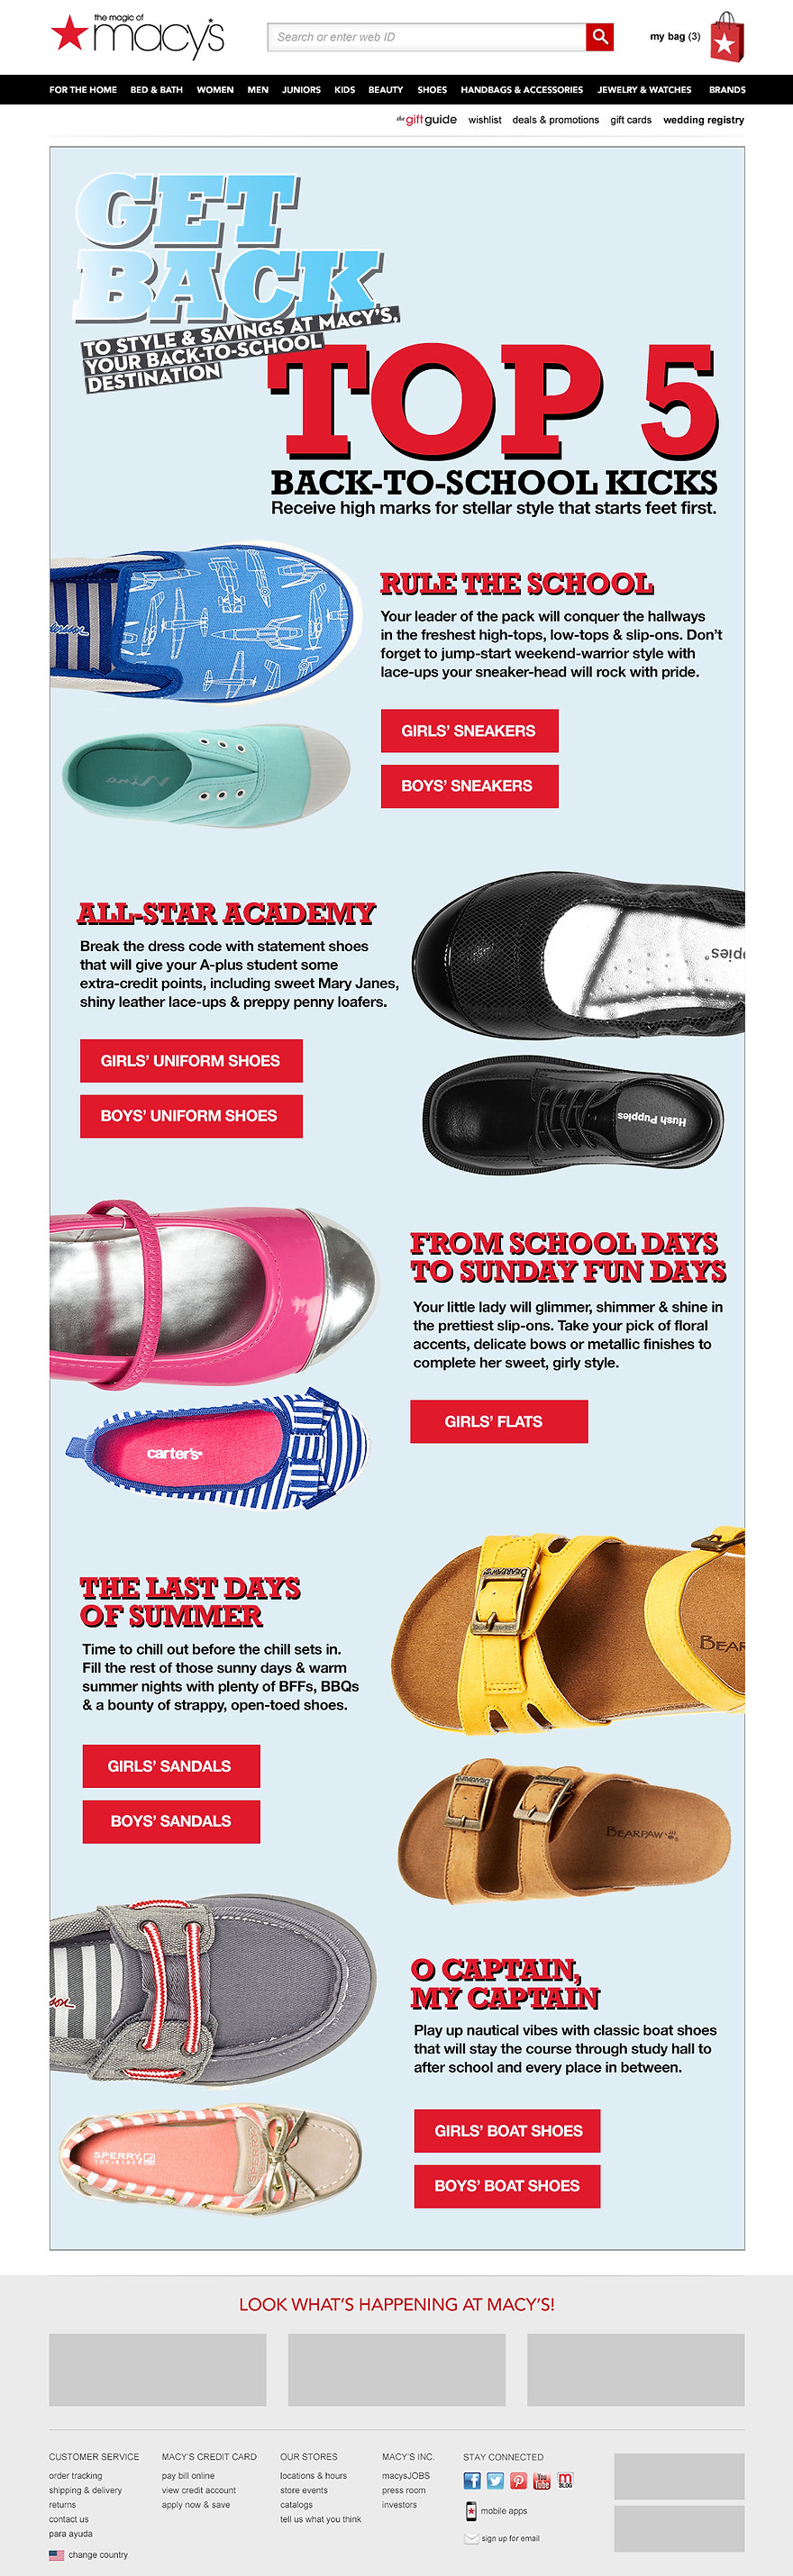 Kids_Shoe_Trend_15_dt1.jpg